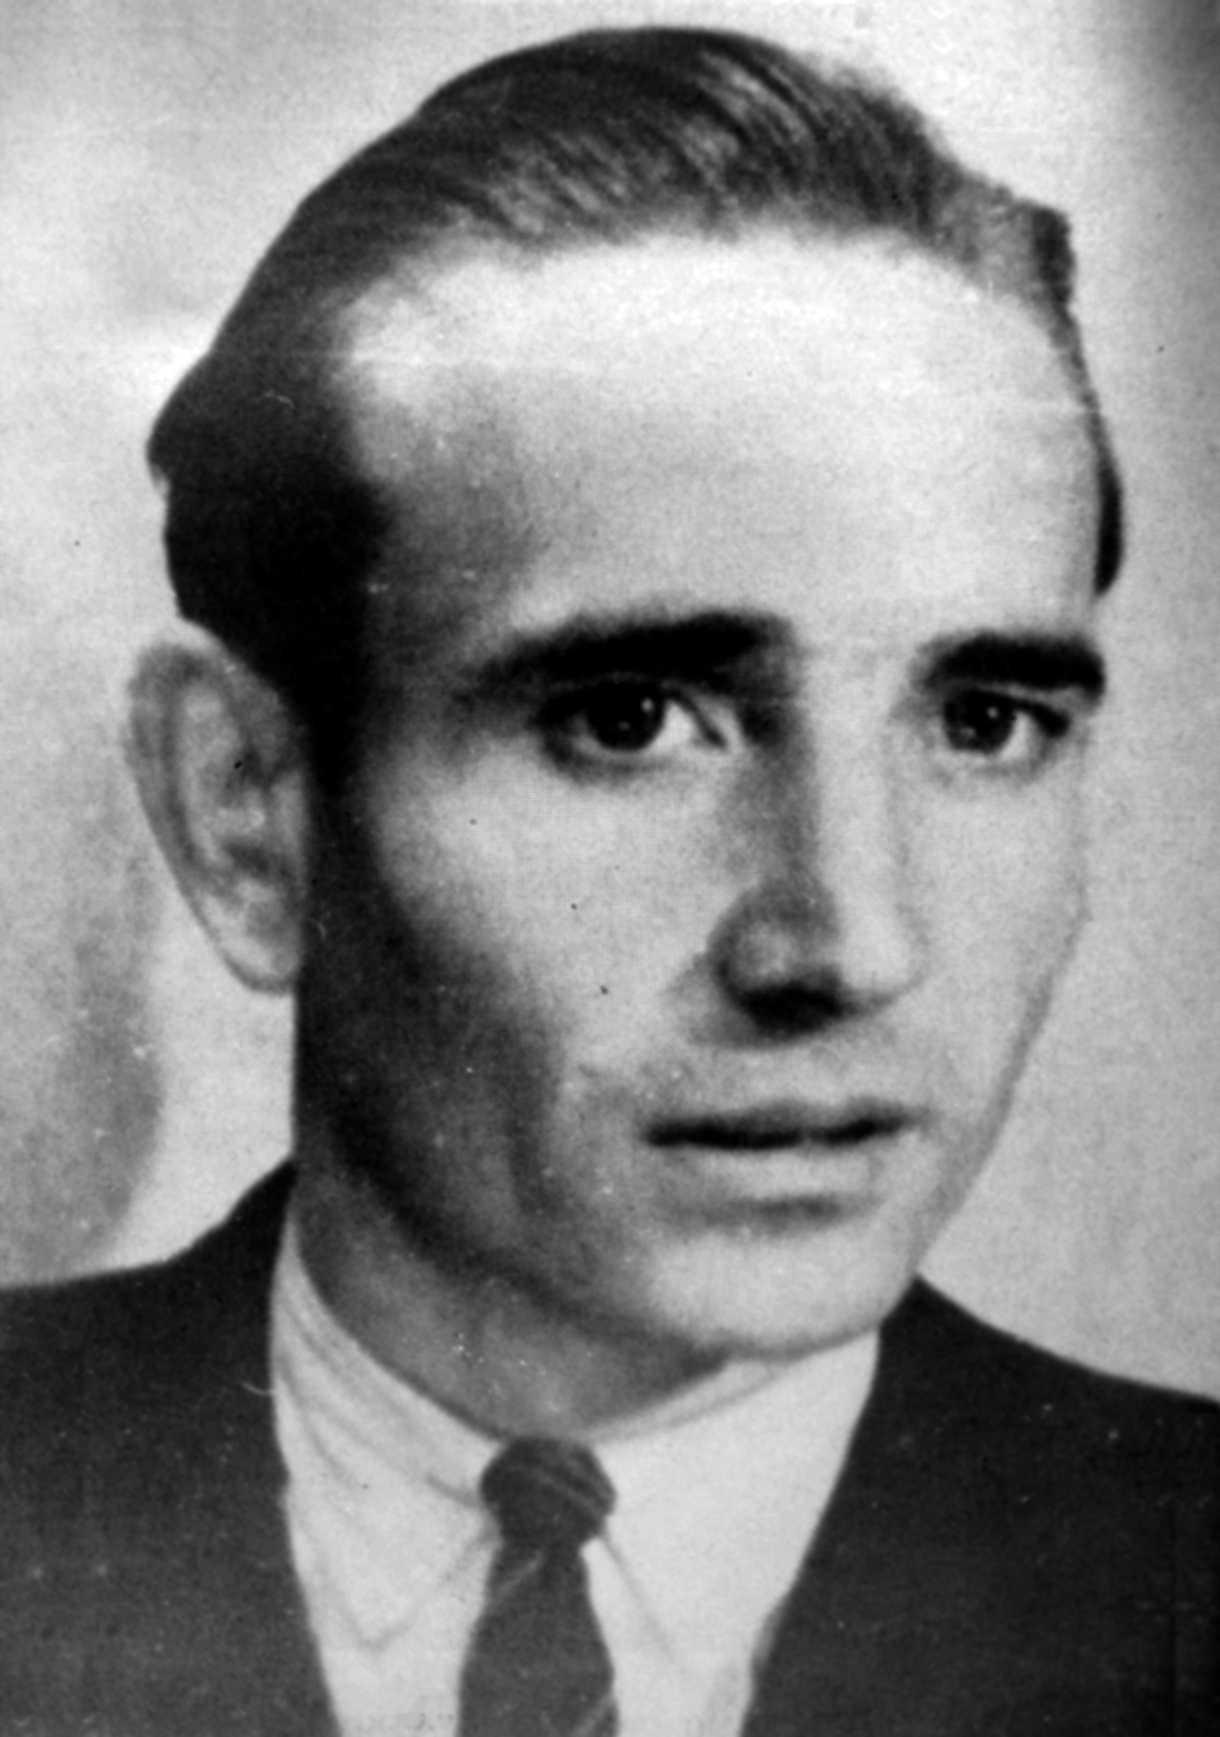 Antonio Gil Oliver